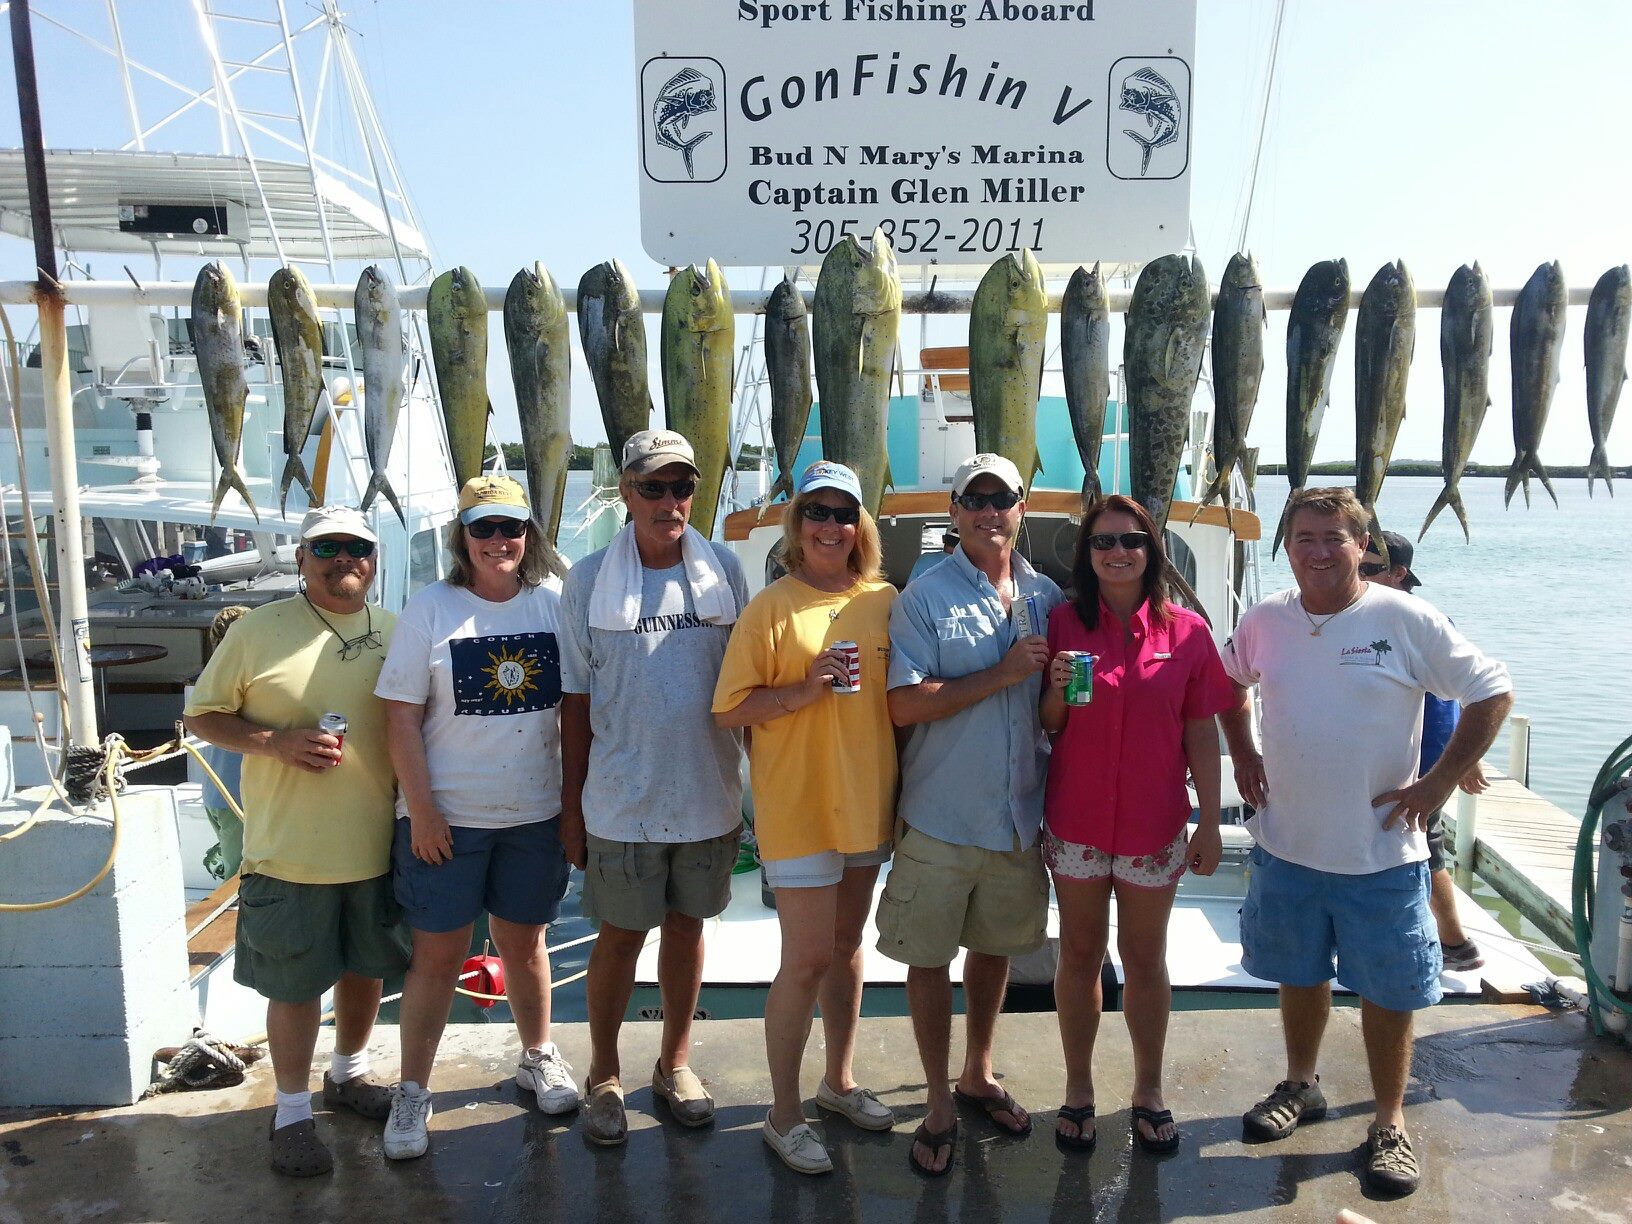 Gonfishin V: Example Full Day Trip